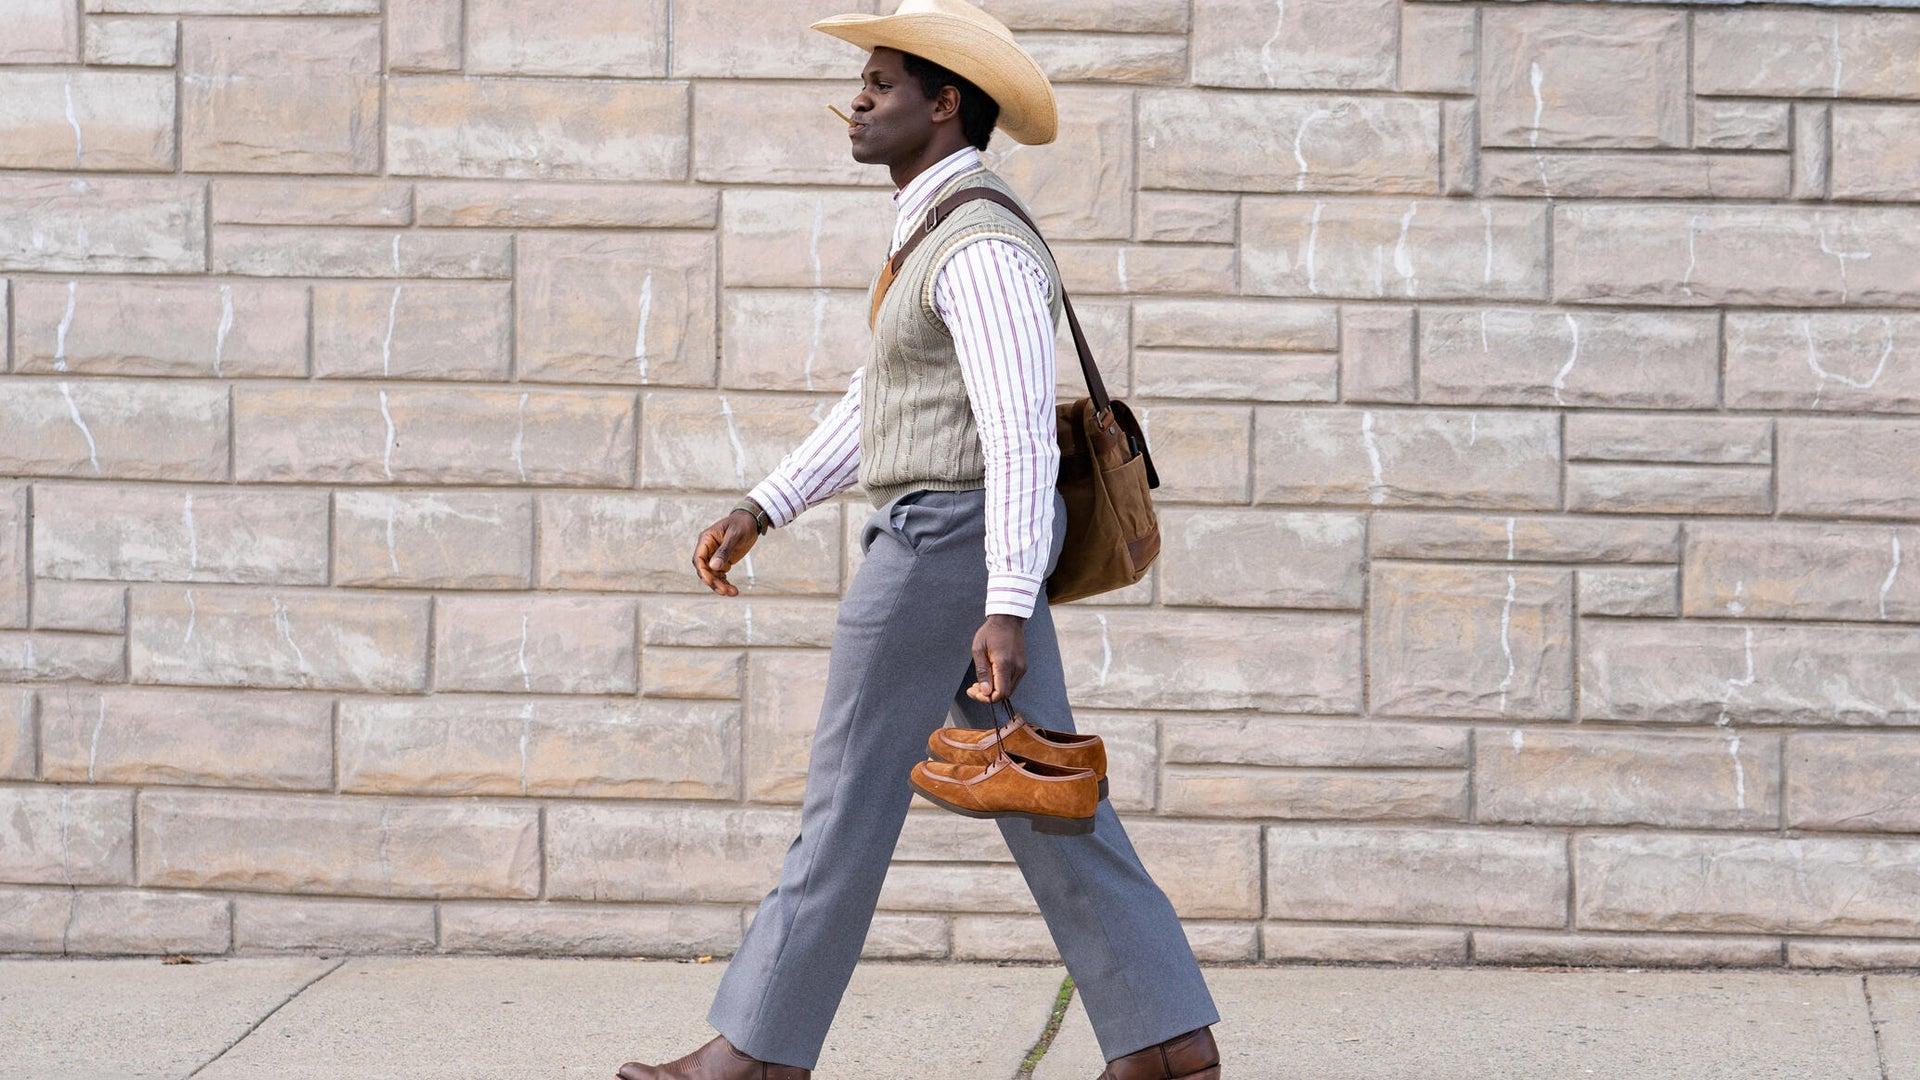 The Cowboy, Little America